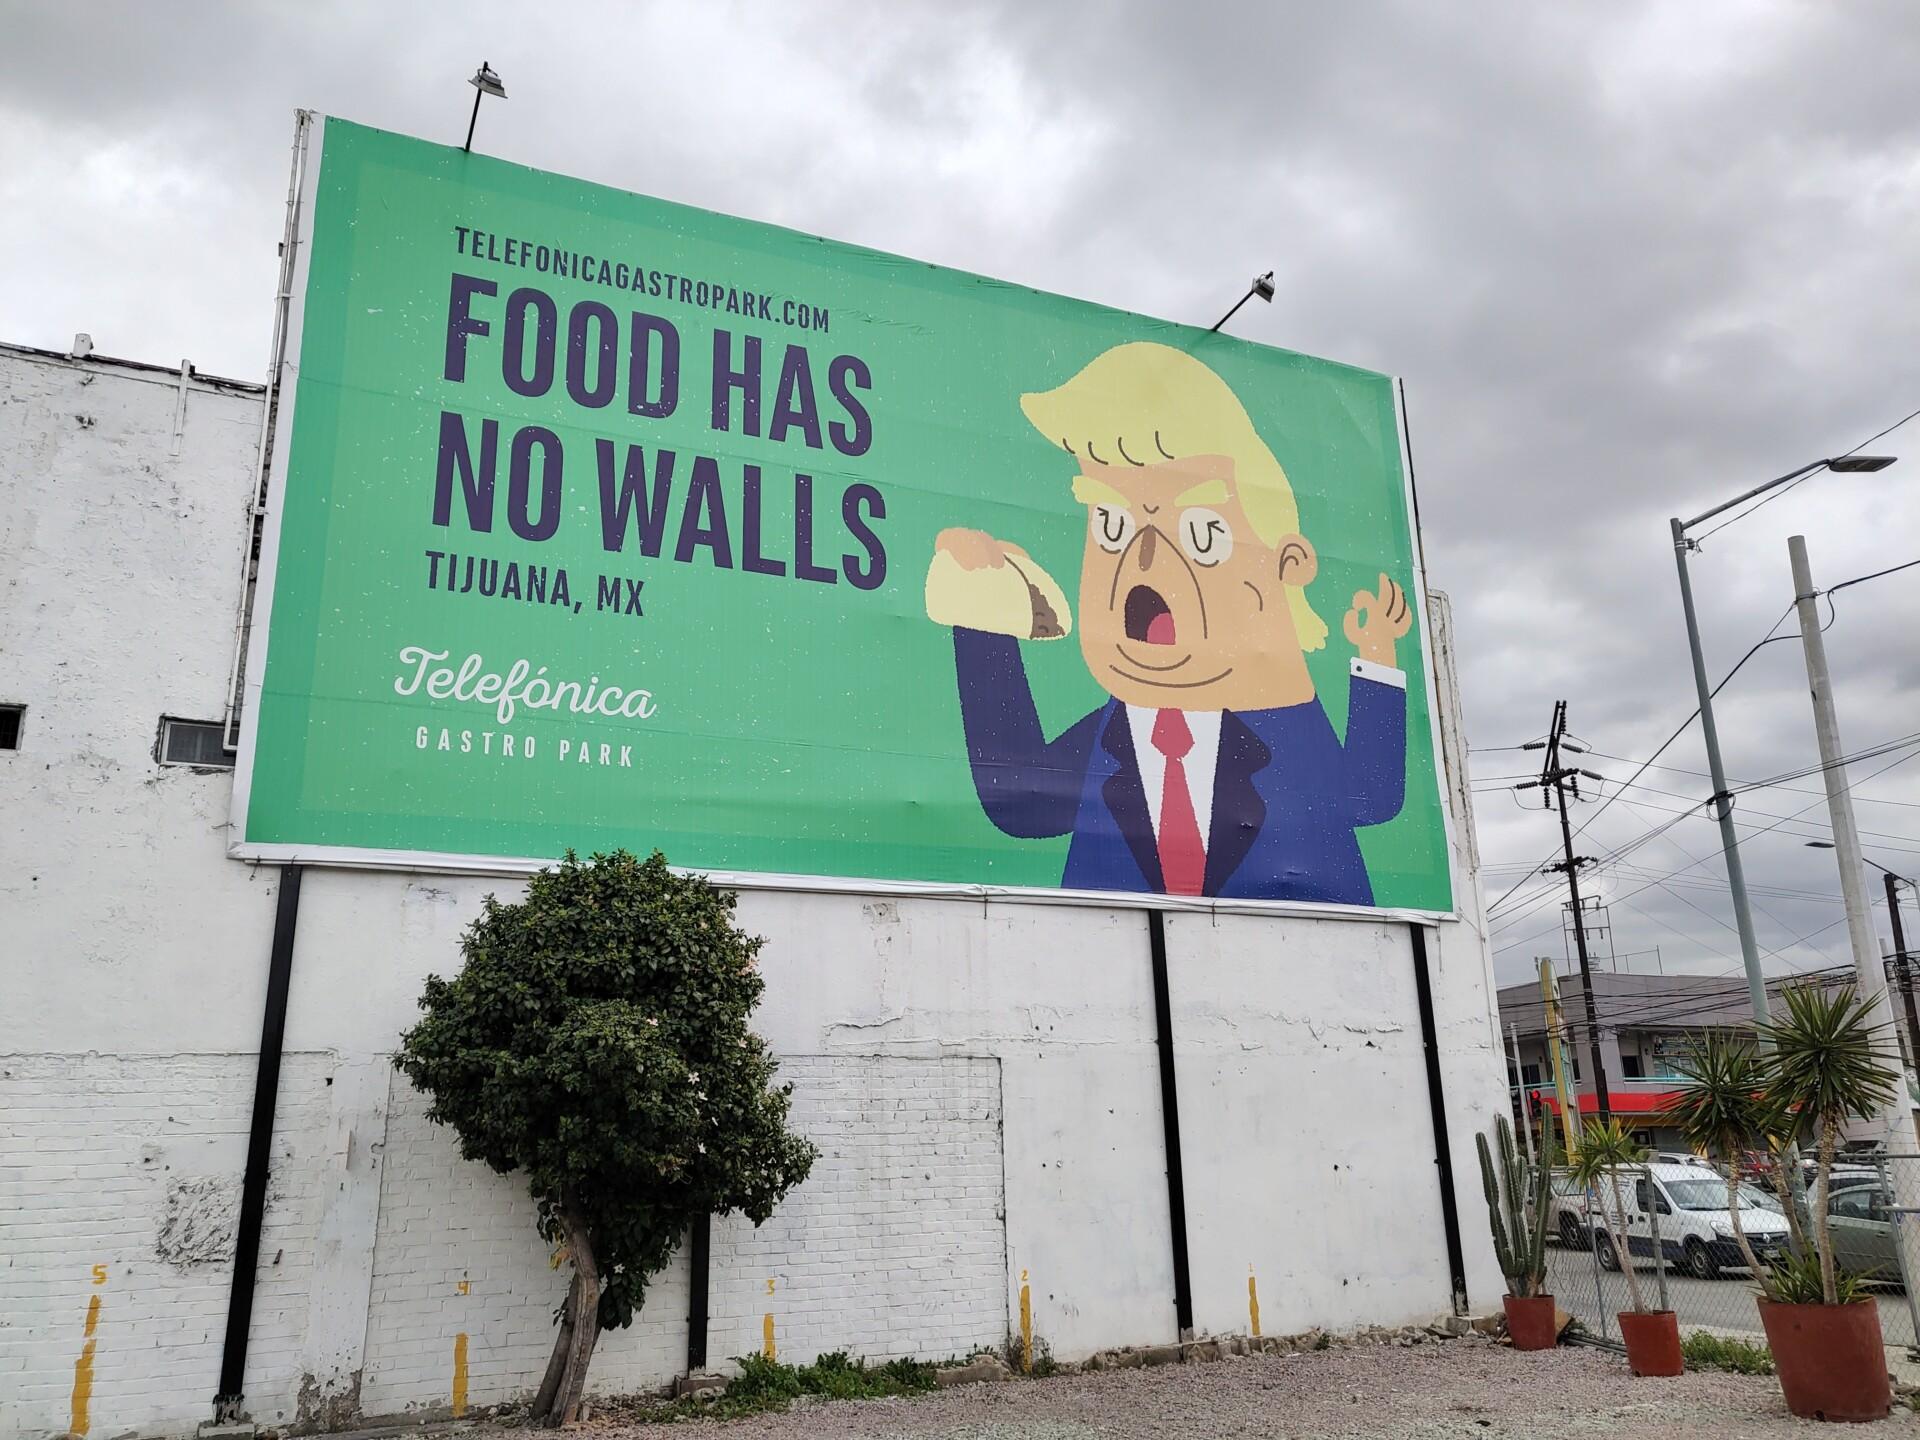 Vivo Nex S daylight sample photo of a billboard